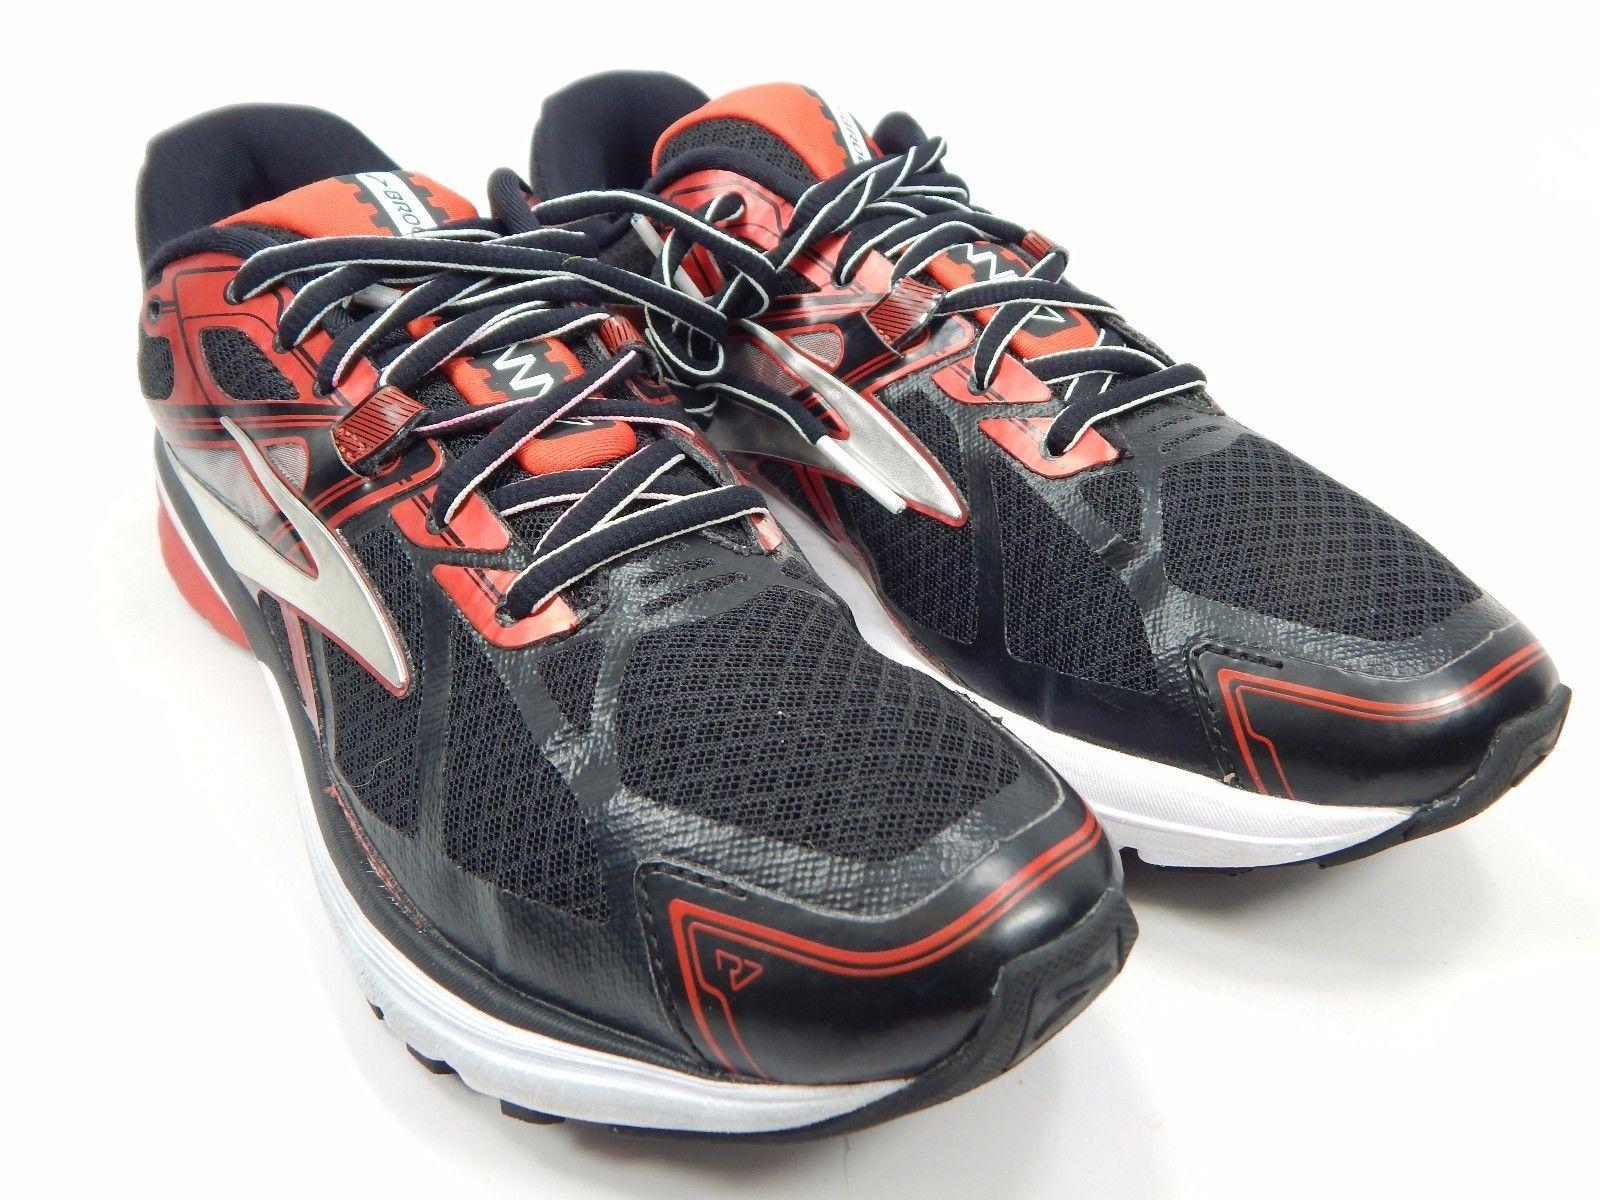 Brooks Ravenna 7 Men's Running Shoes Size US 8 M (D) EU 41 Red Black 1102171D062